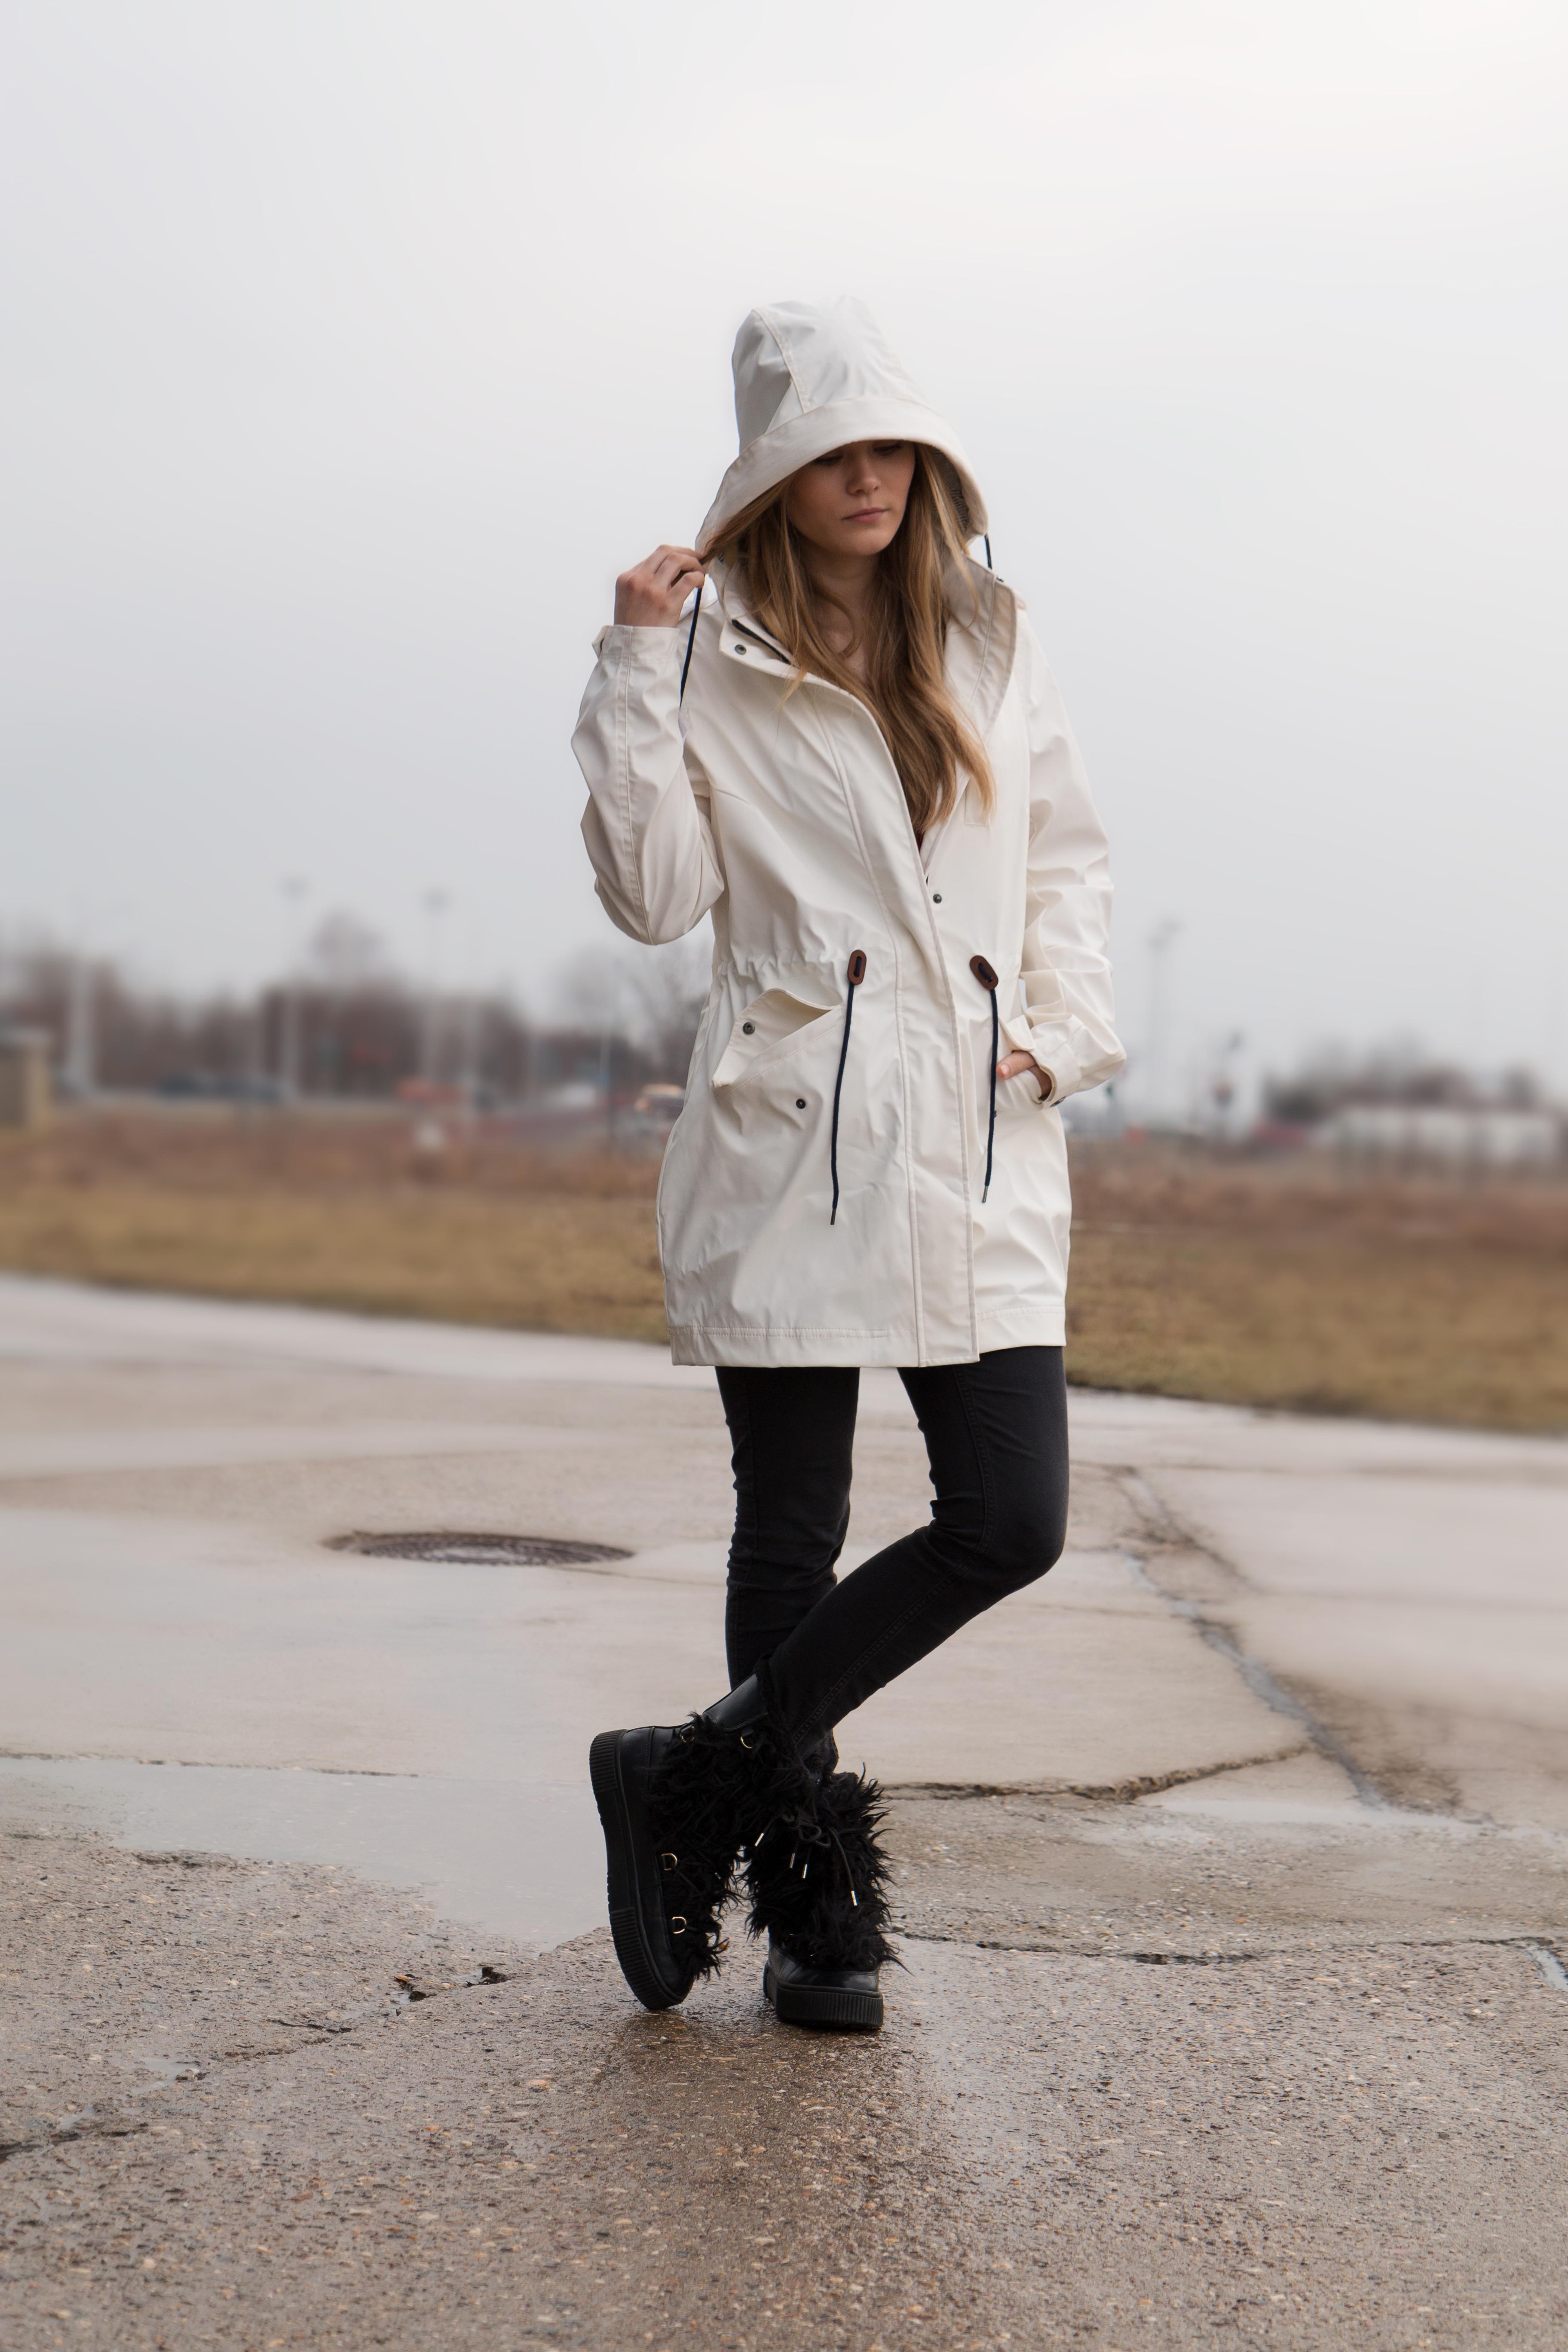 Nickel_Regenbekleidung_Damen